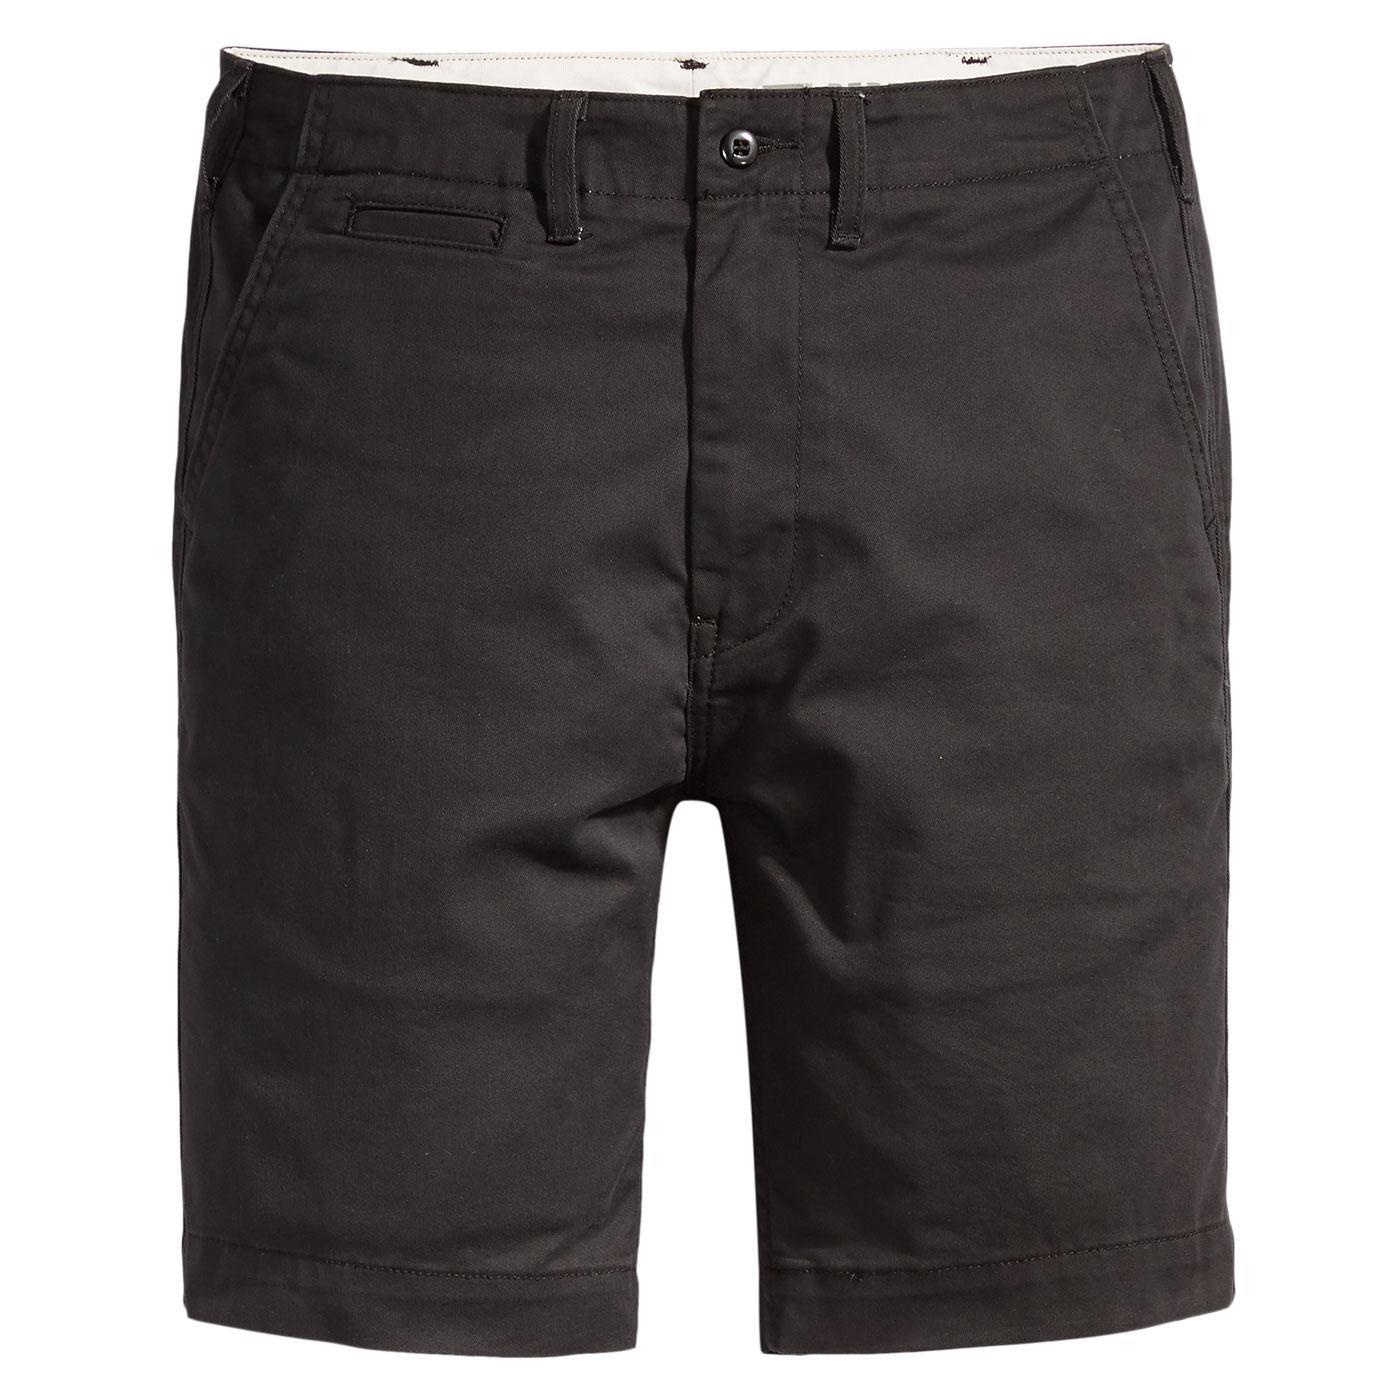 LEVI'S 502 Regular Fit True Chino Shorts (Caviar)